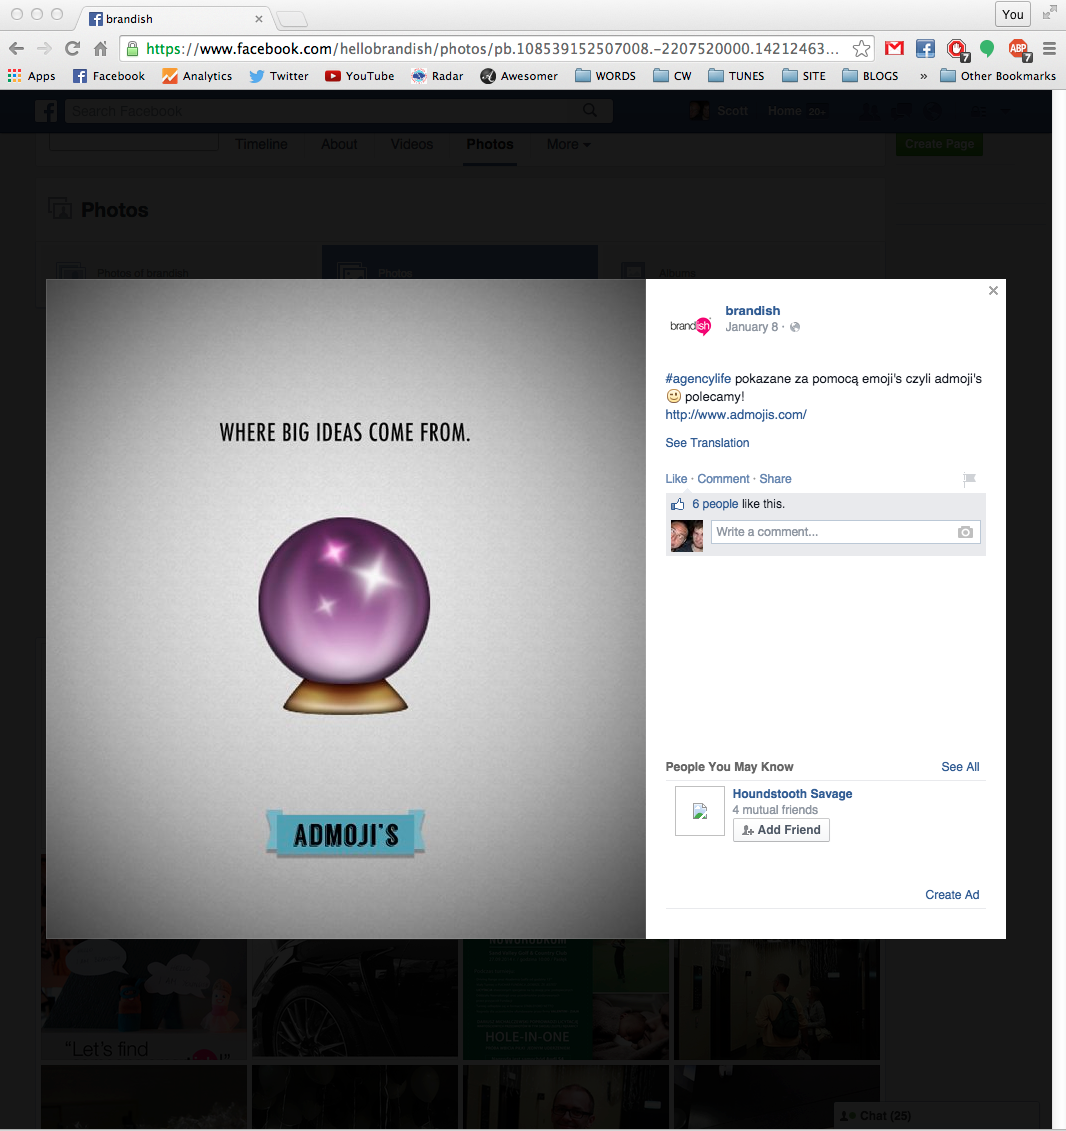 Brandish Facebook.png